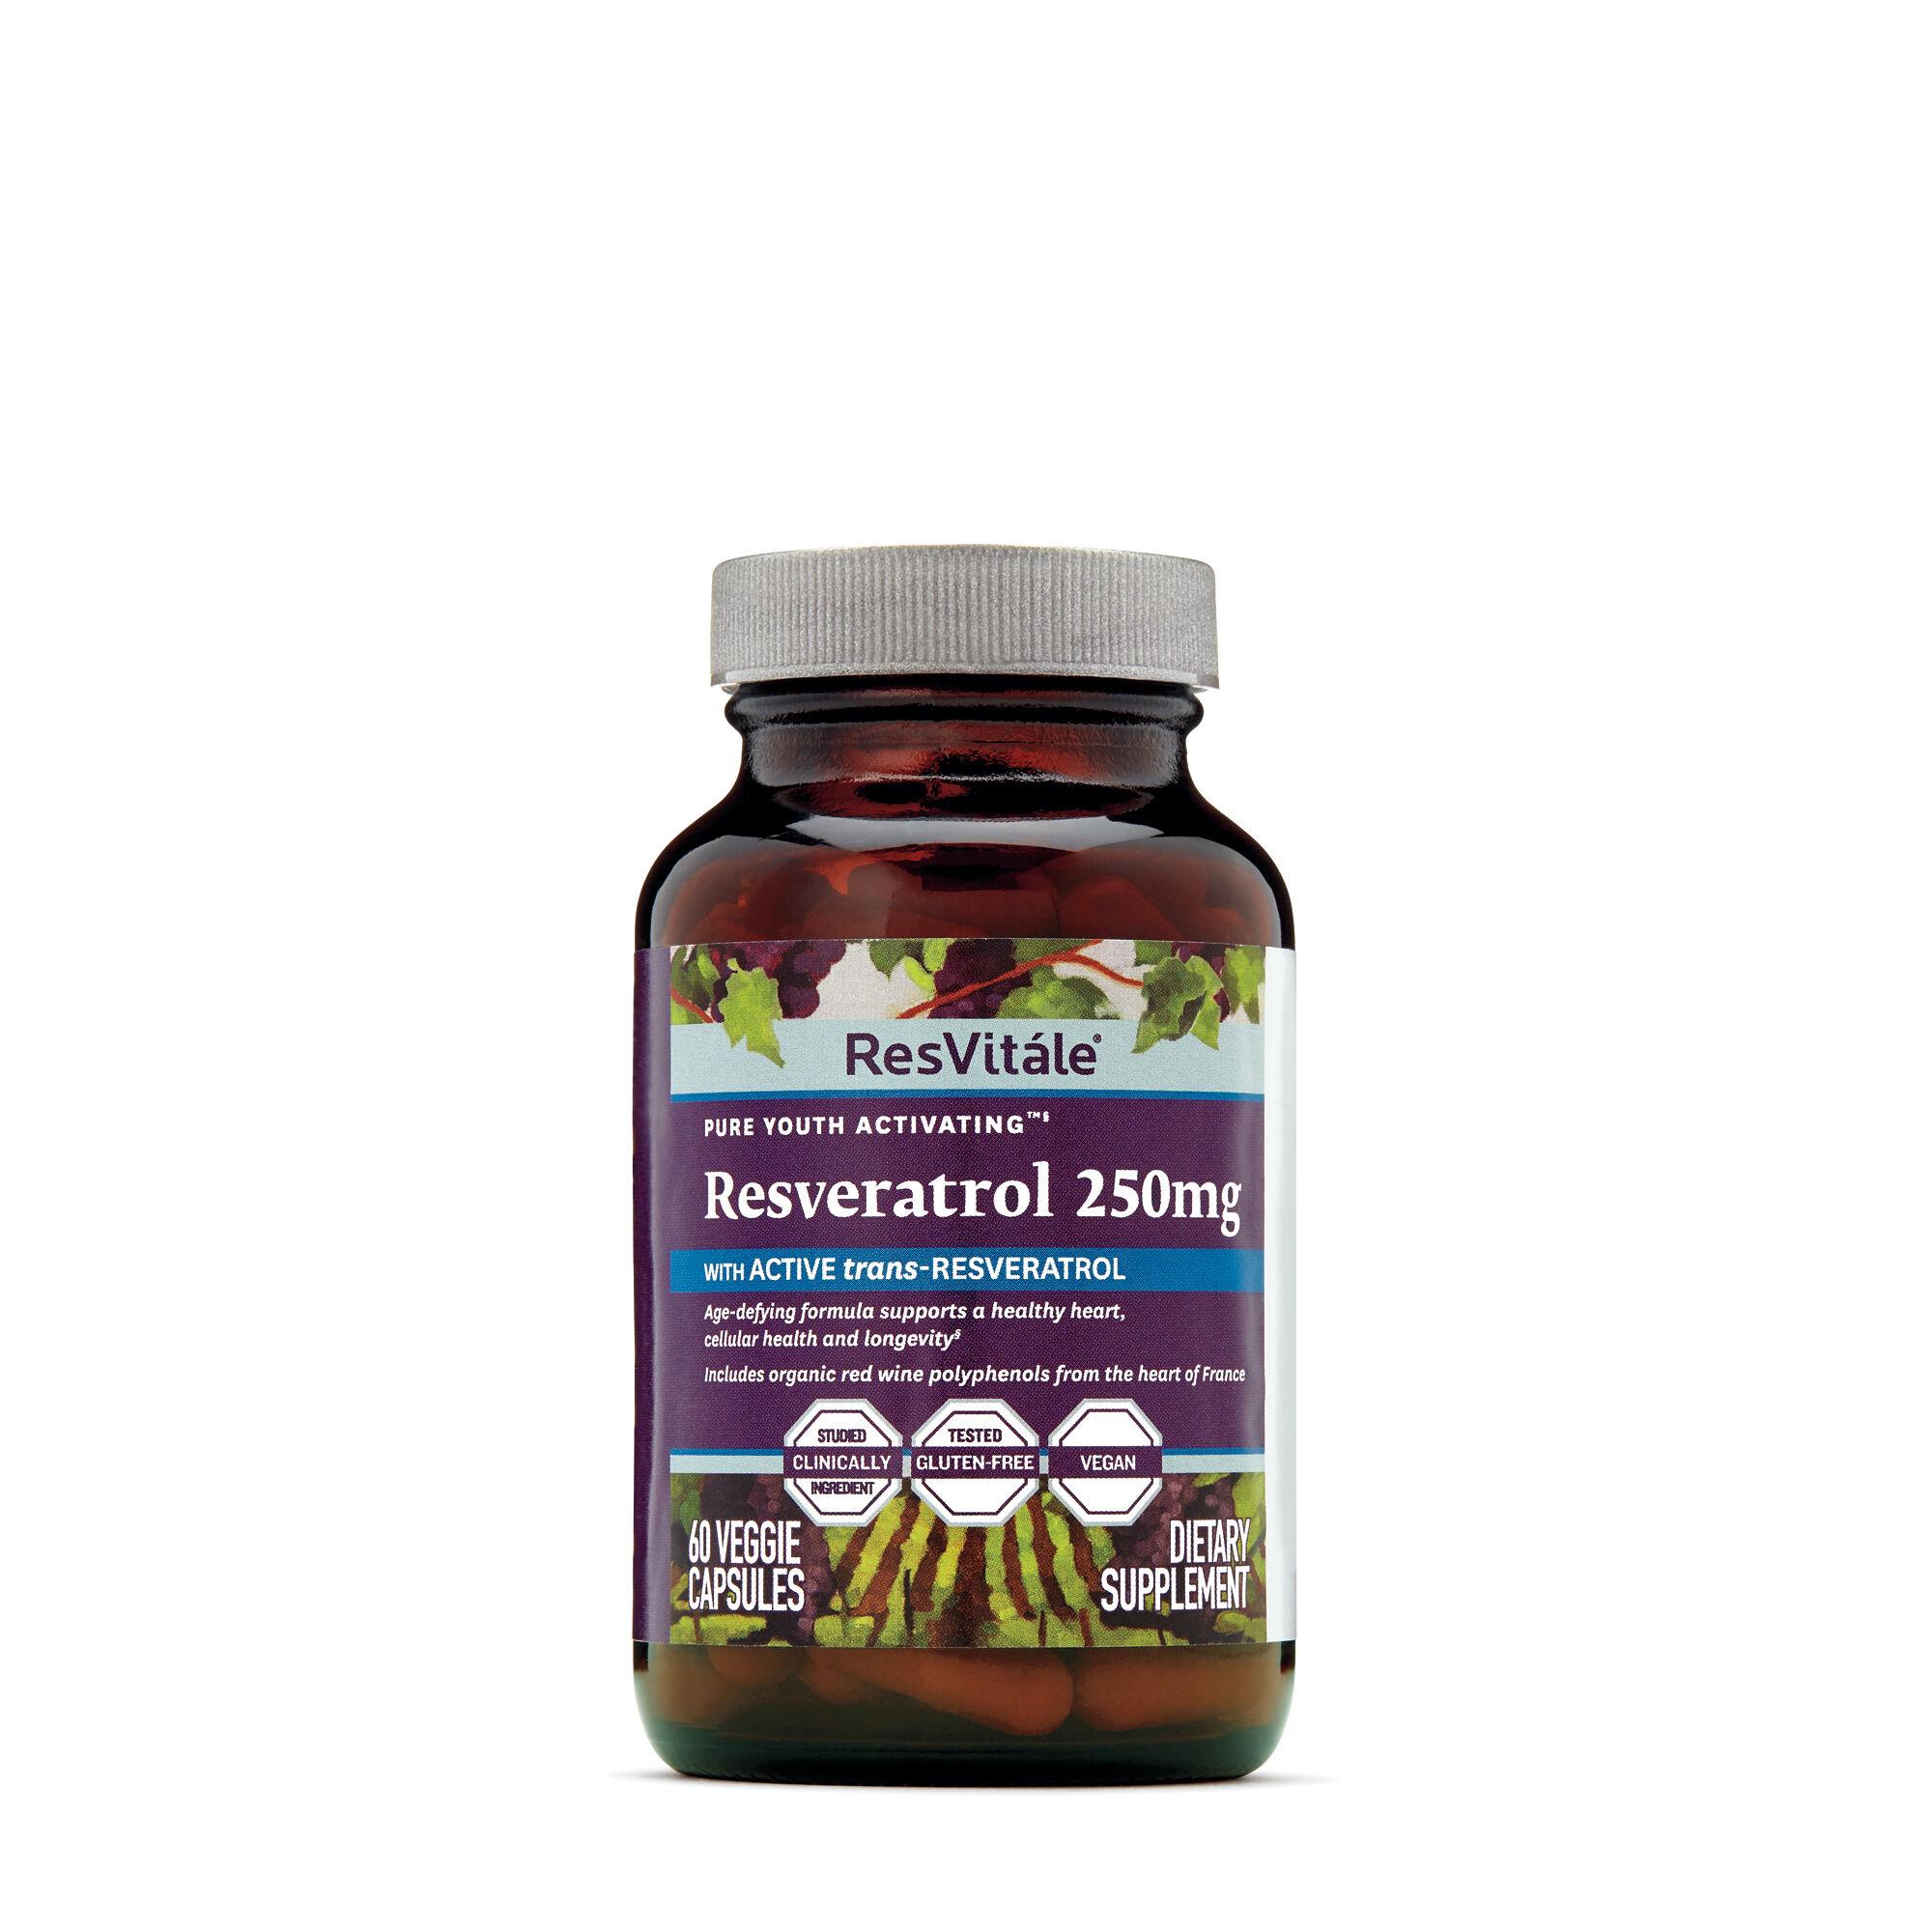 Resvitale Resveratrol 250mg Gnc